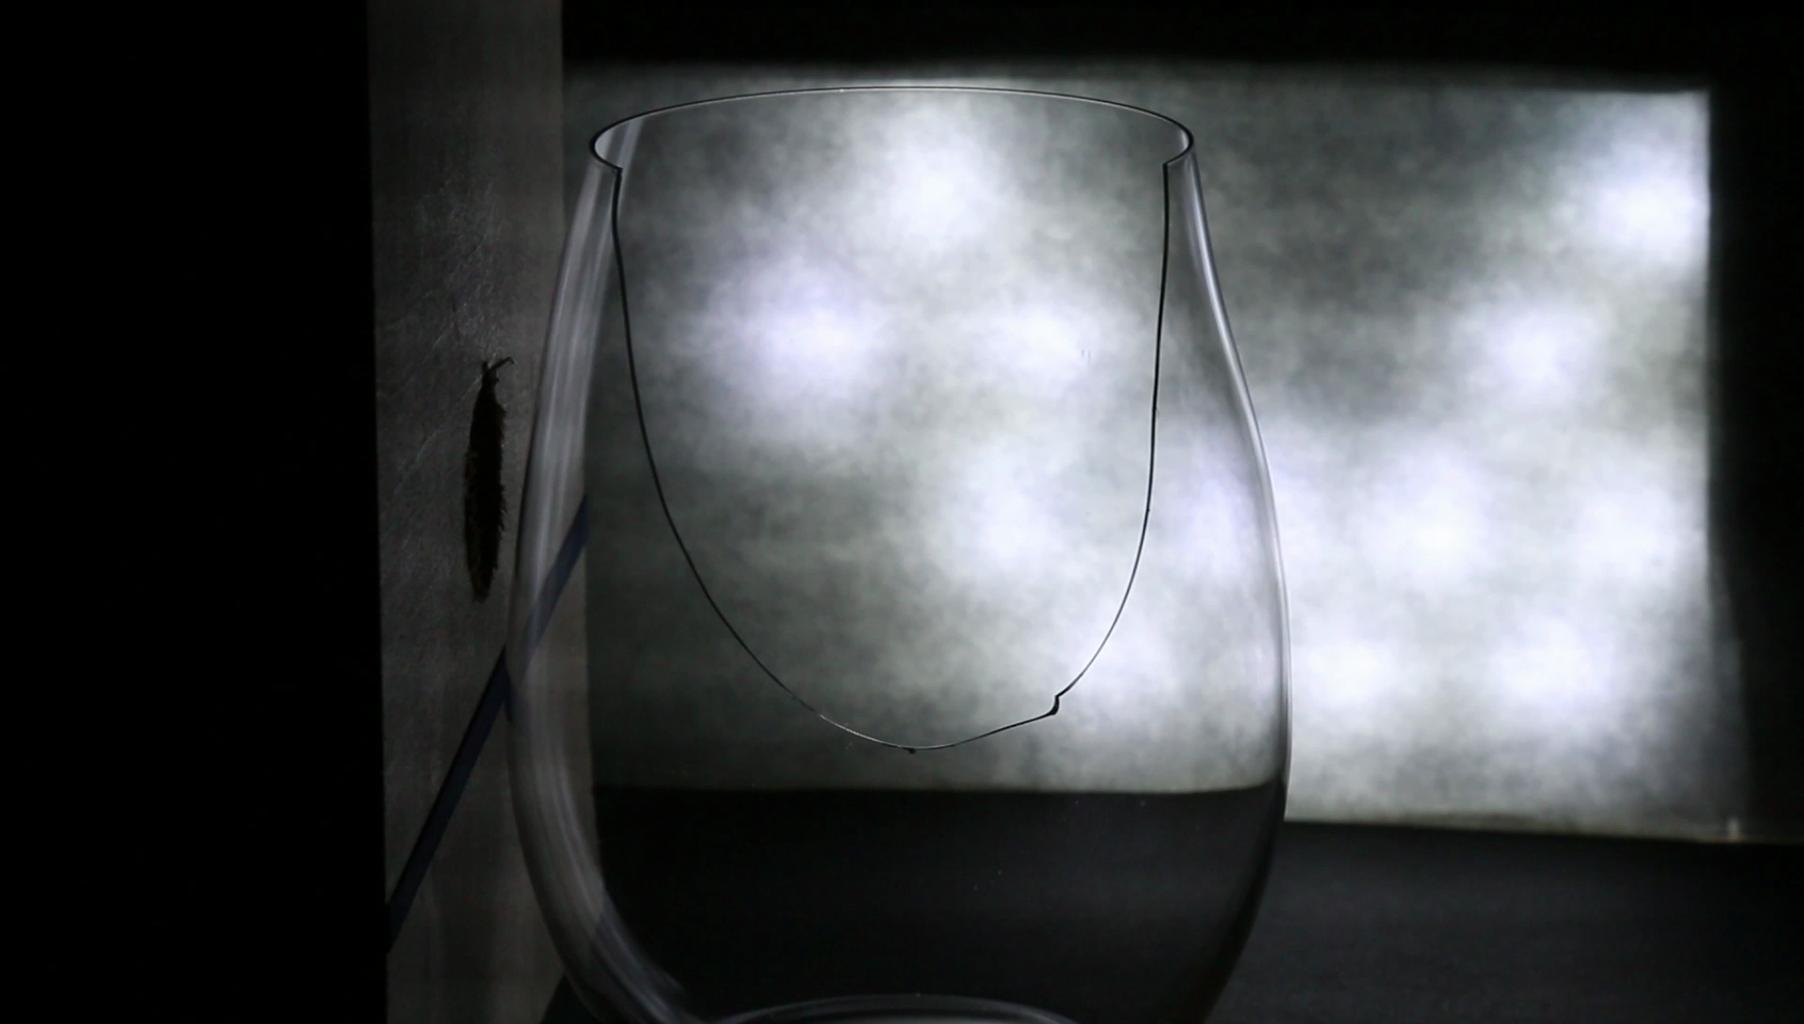 Breaking Wine Glasses